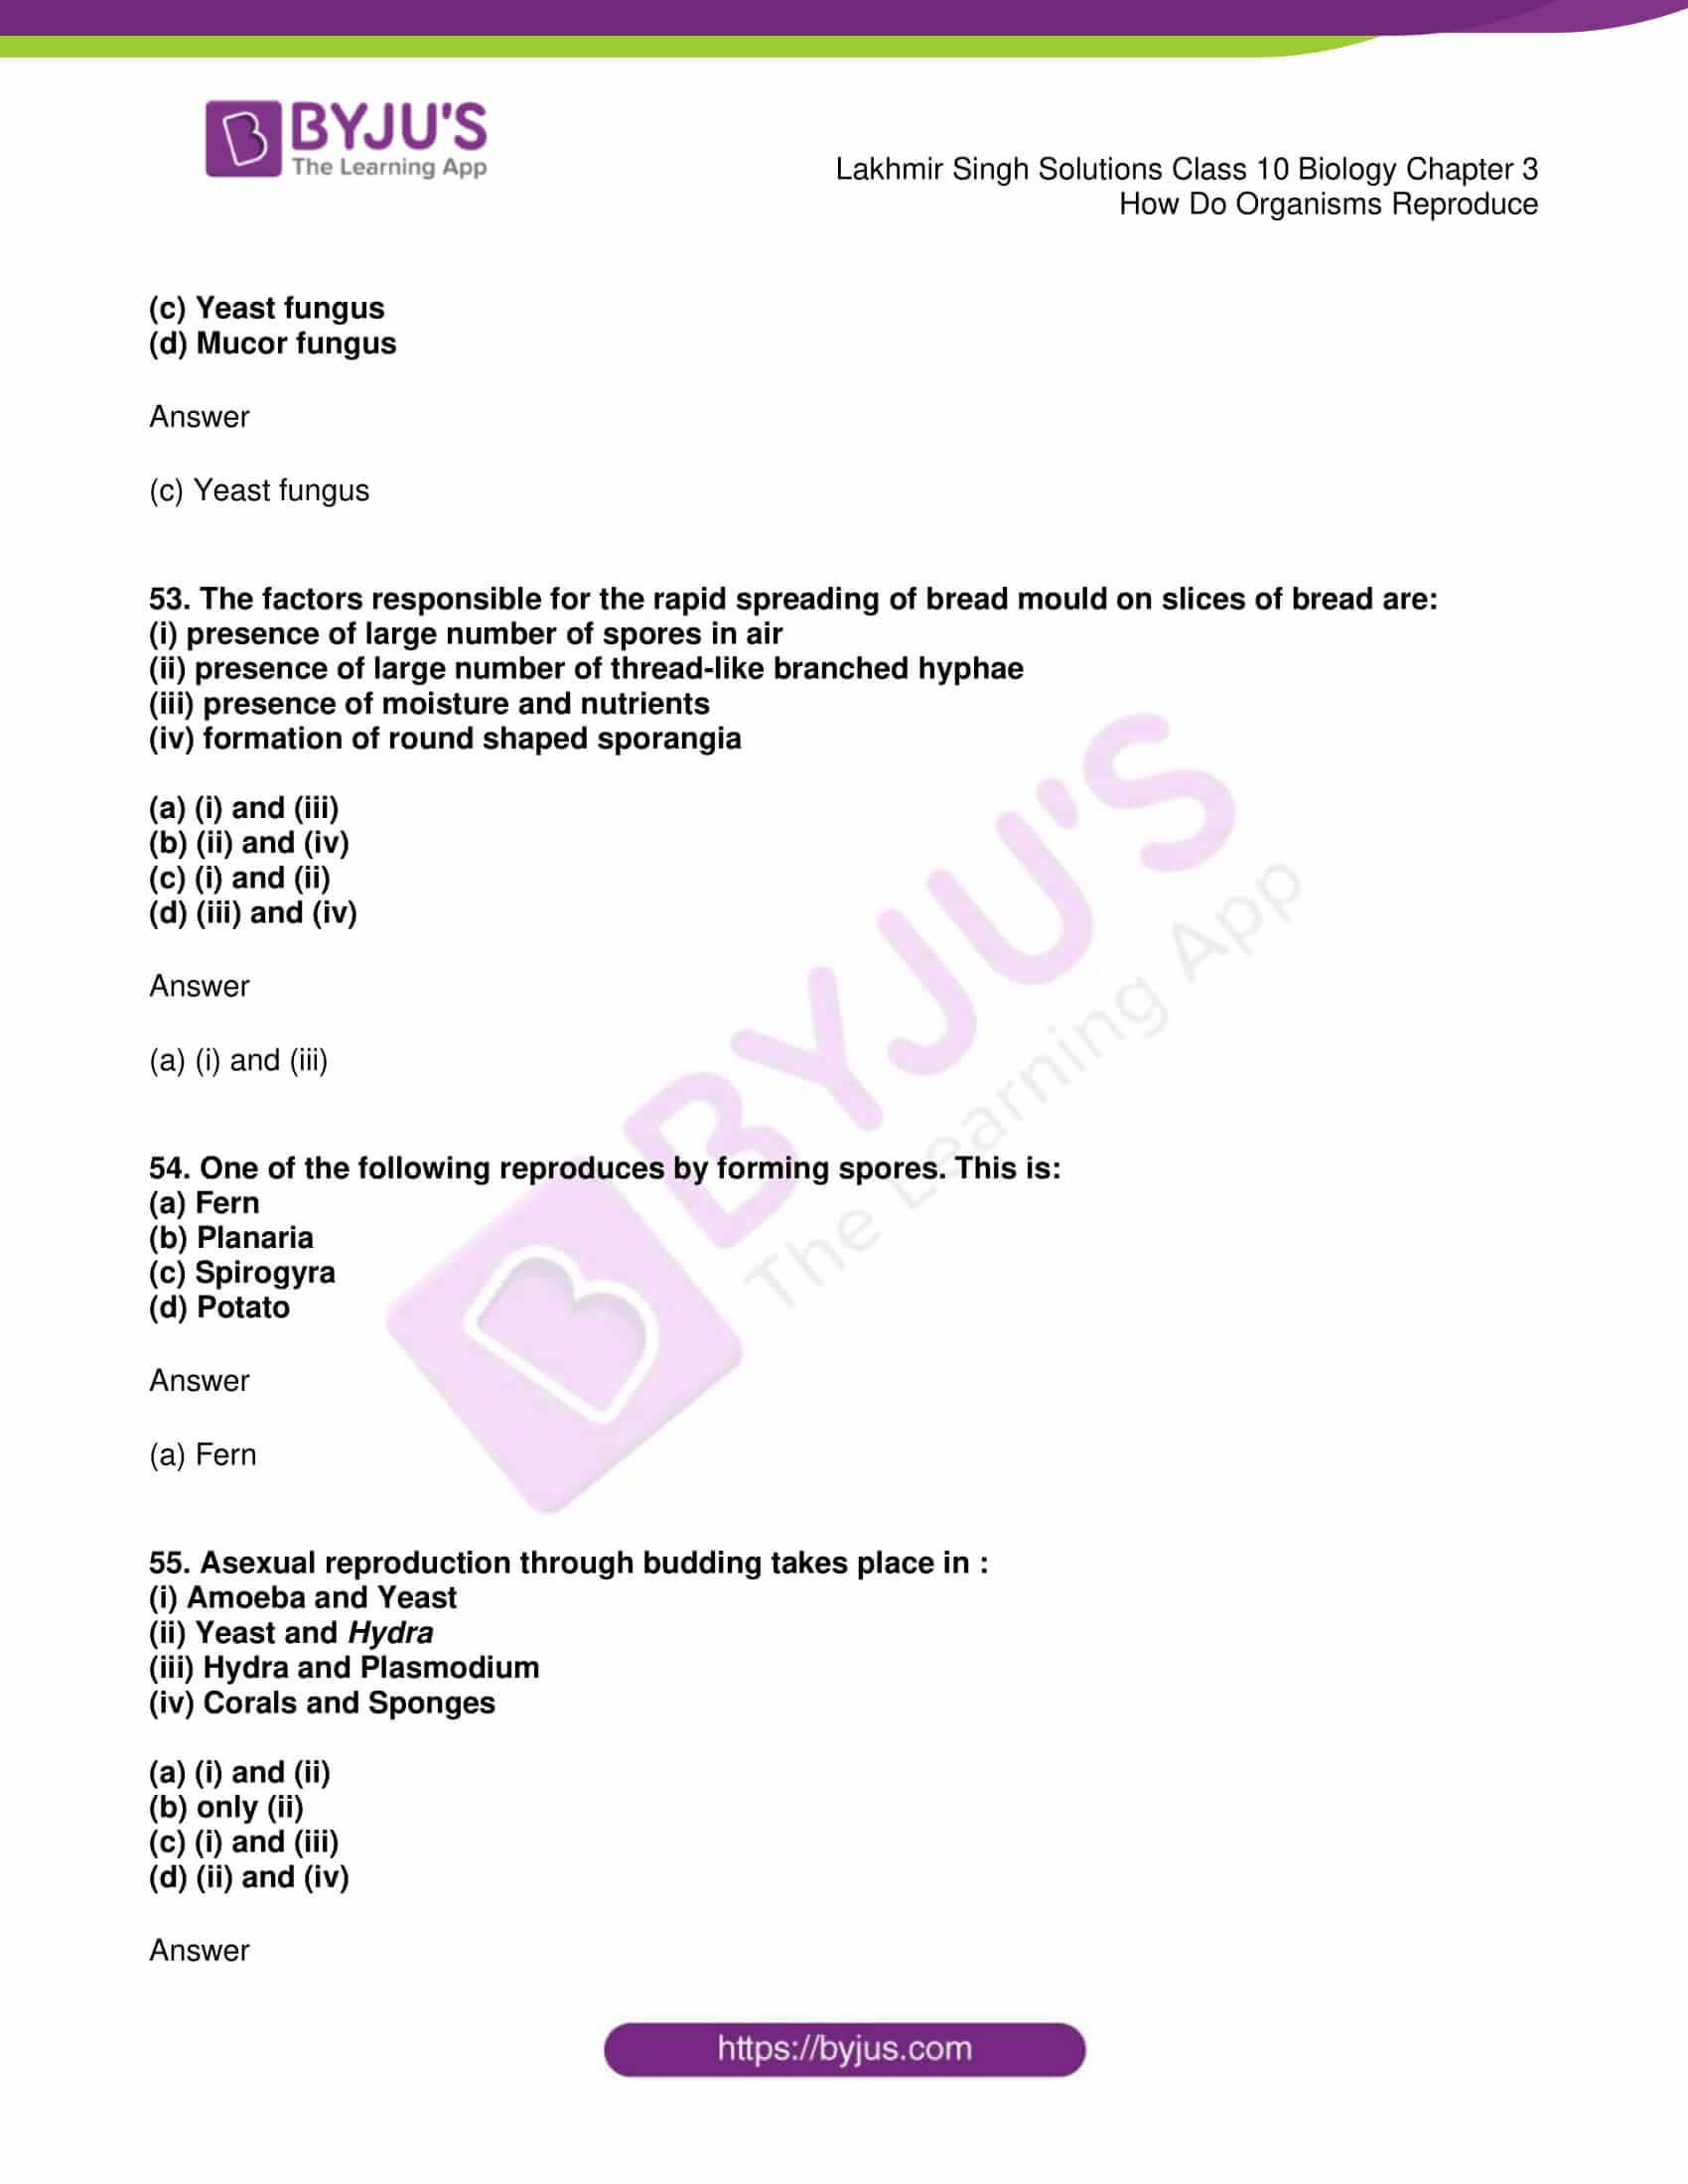 lakhmir singh solutions class 10 biology chapter 3 20